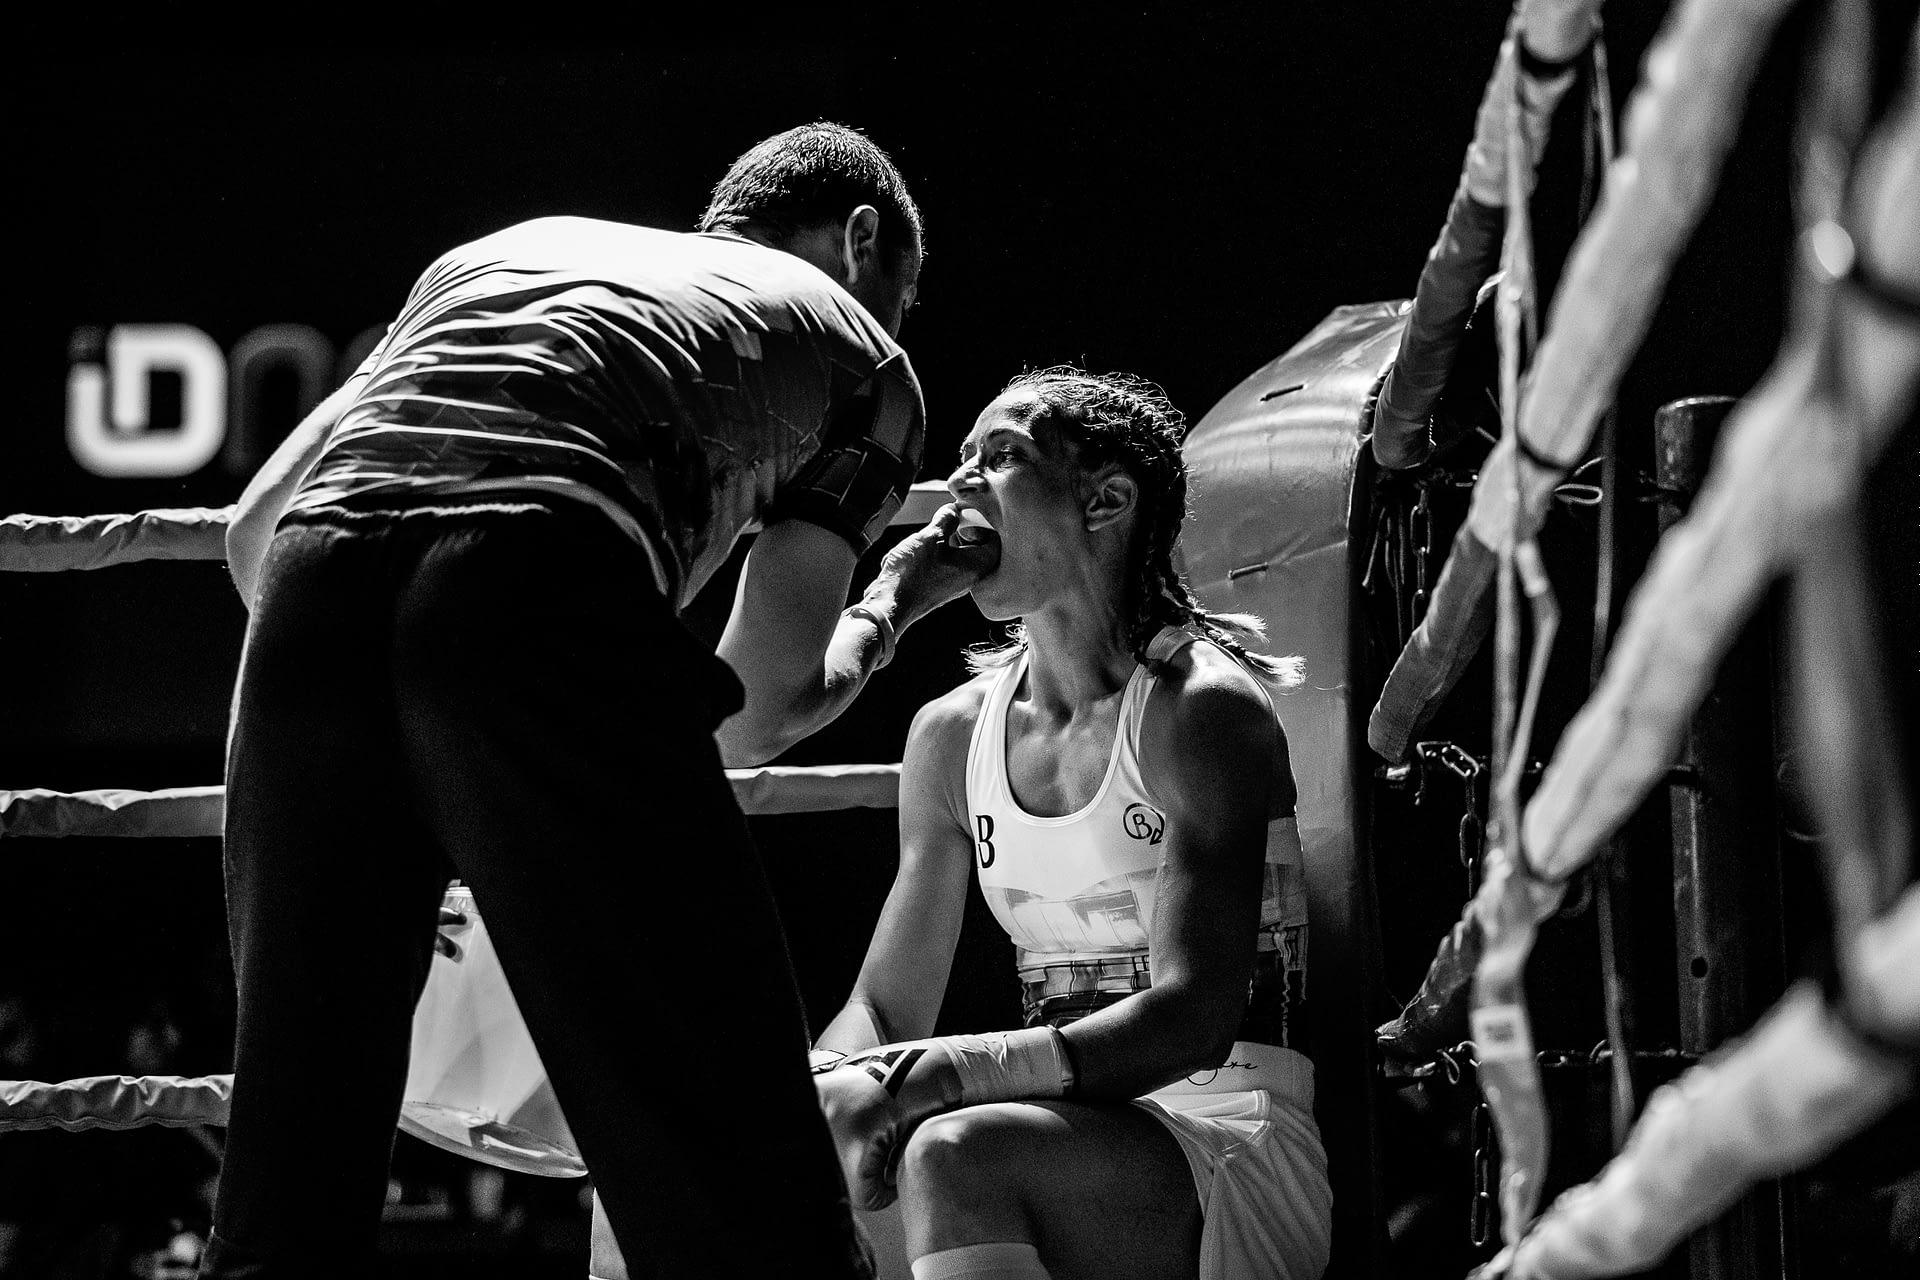 Olivia (Boa) Boudouma vs. Aleksandra Vujovic by STEMUTZ, La Prillaz, 2019